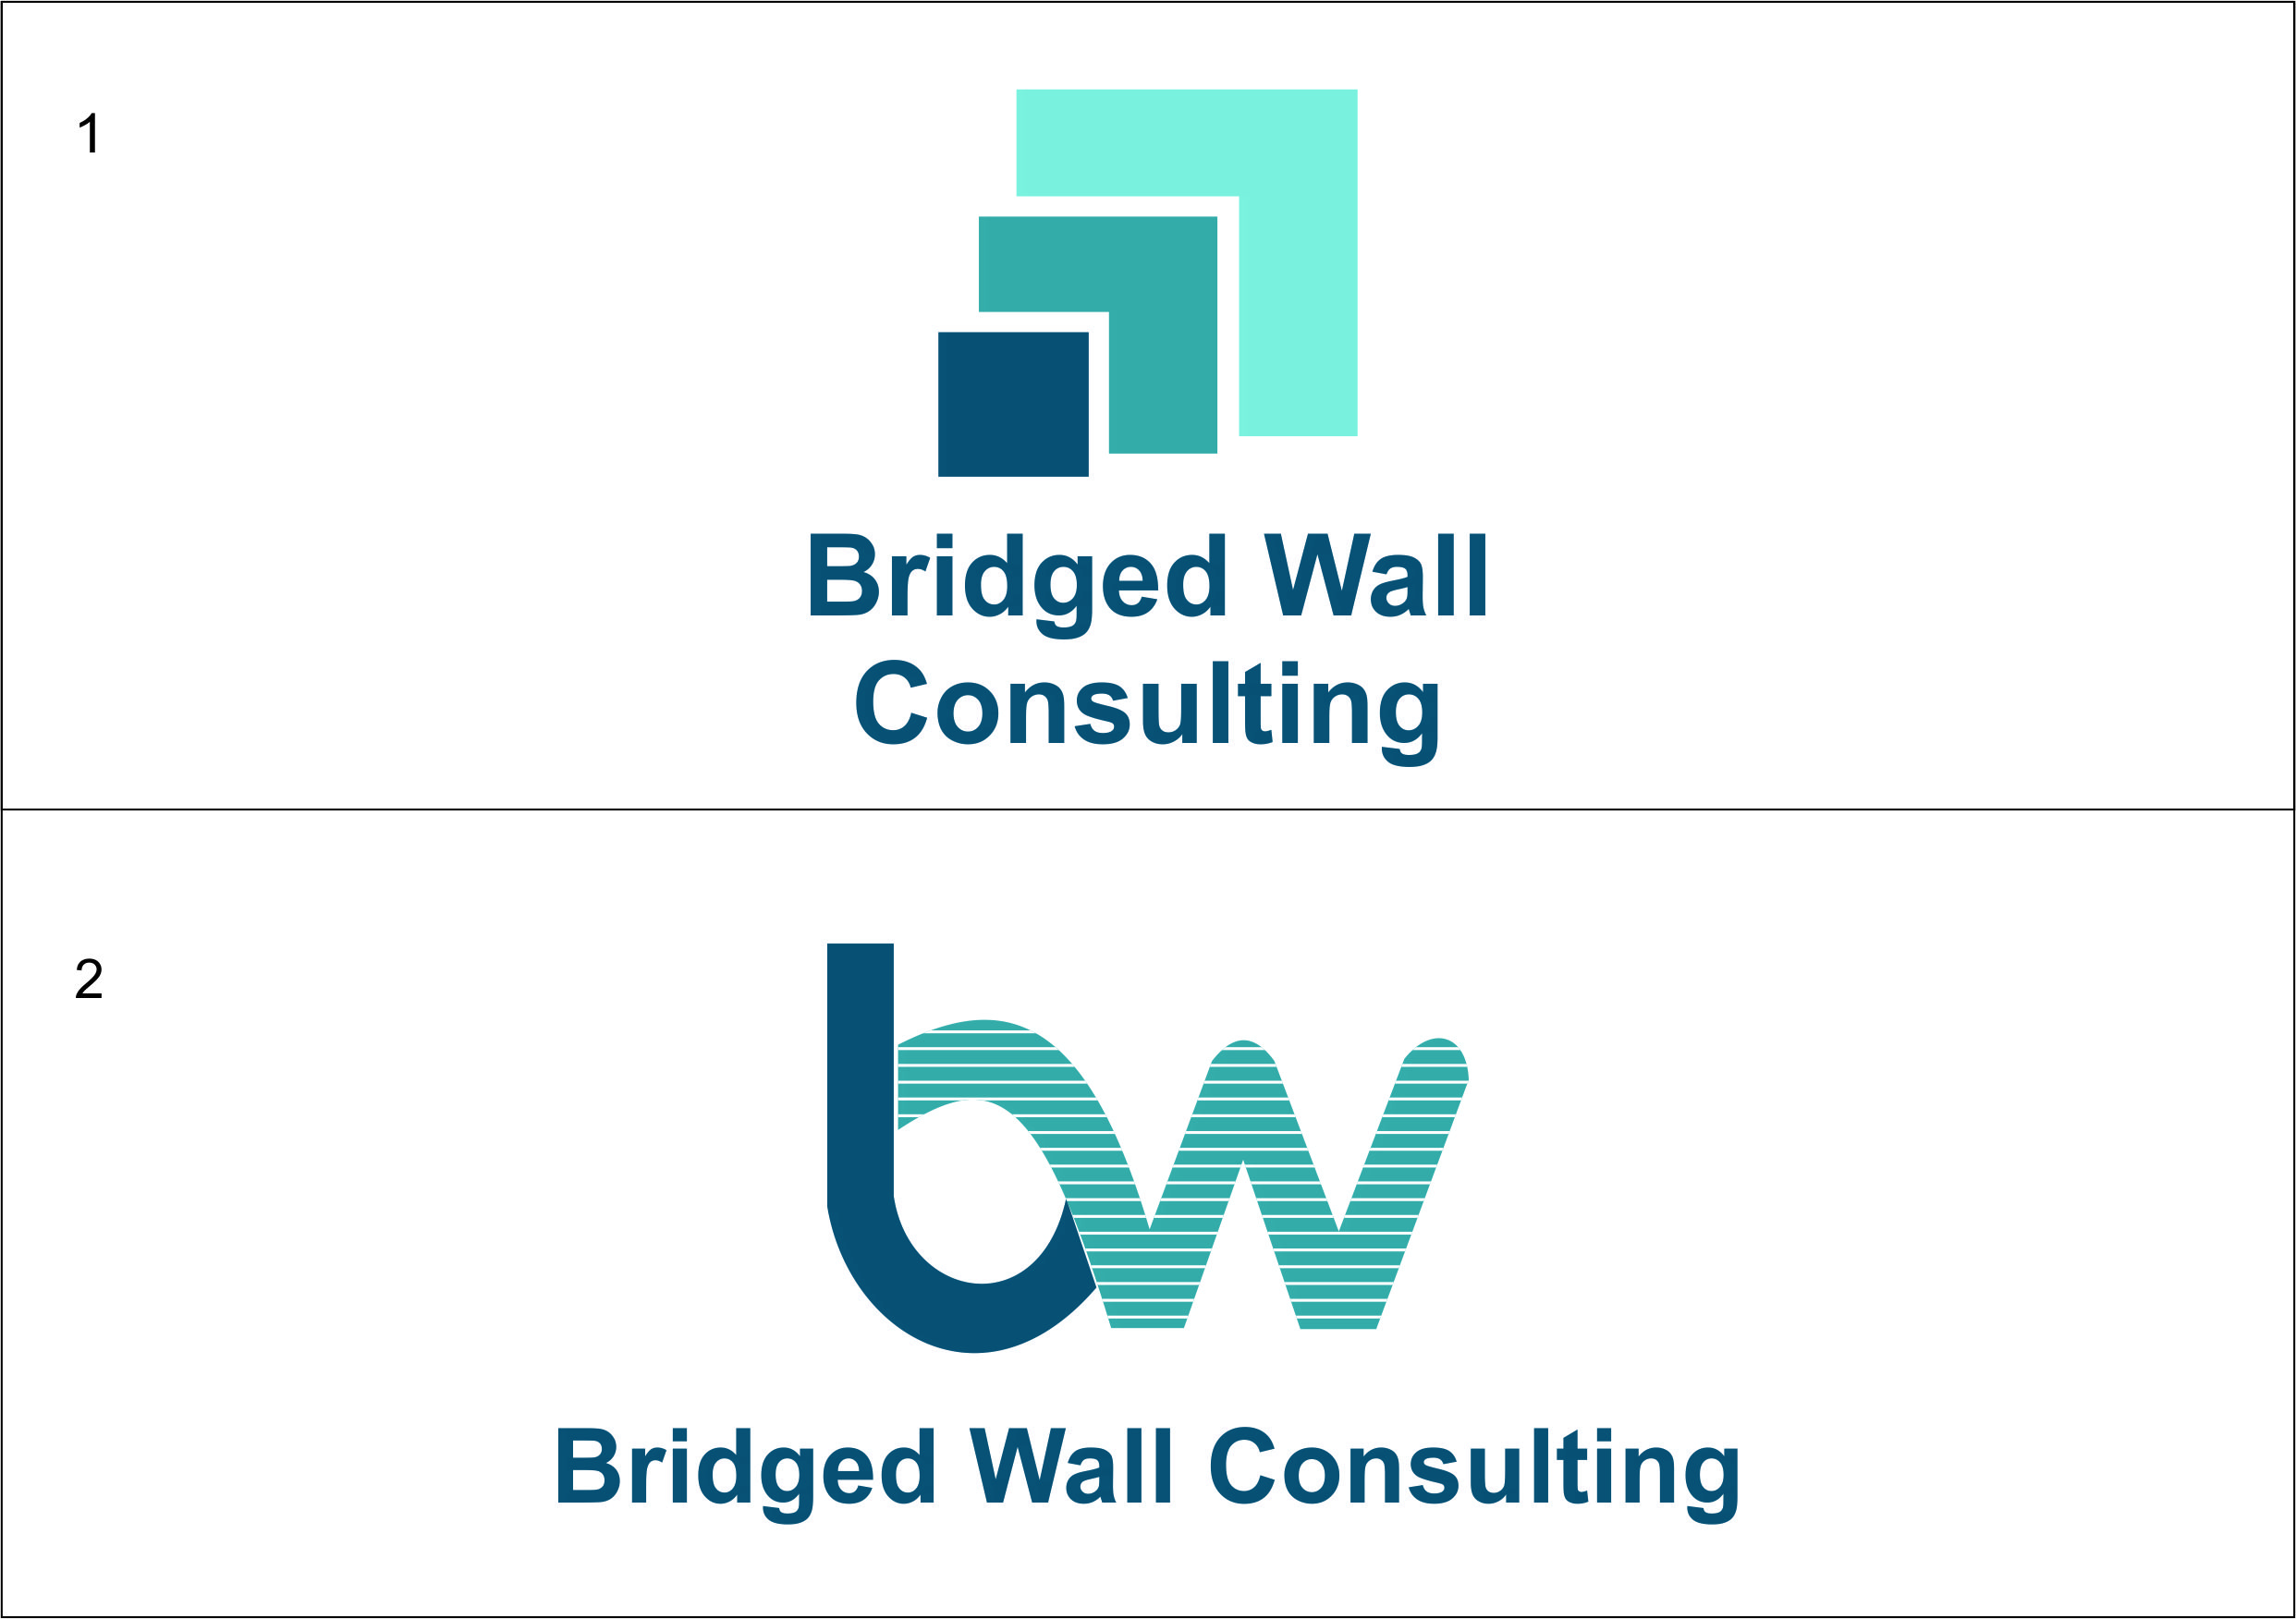 BridgedWall Consulting